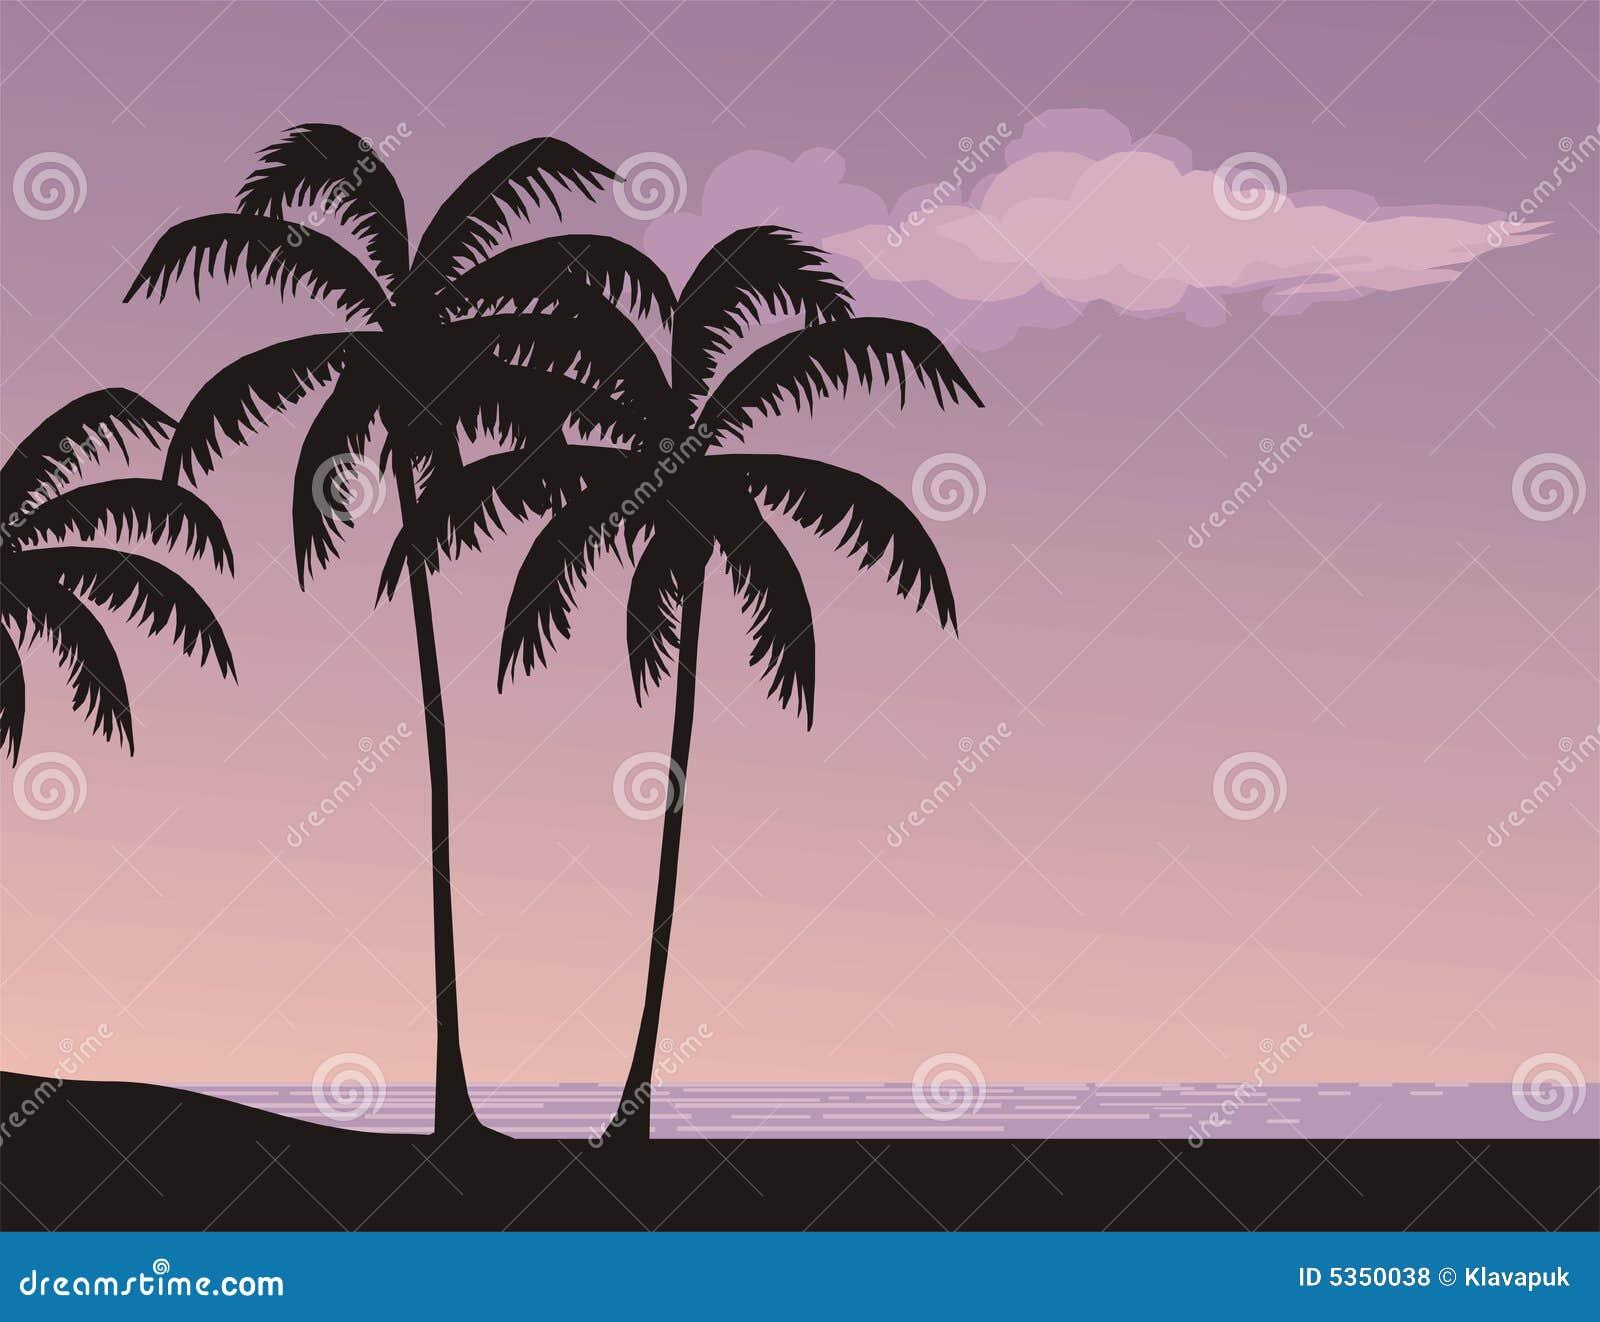 vector scenery tropical - photo #49